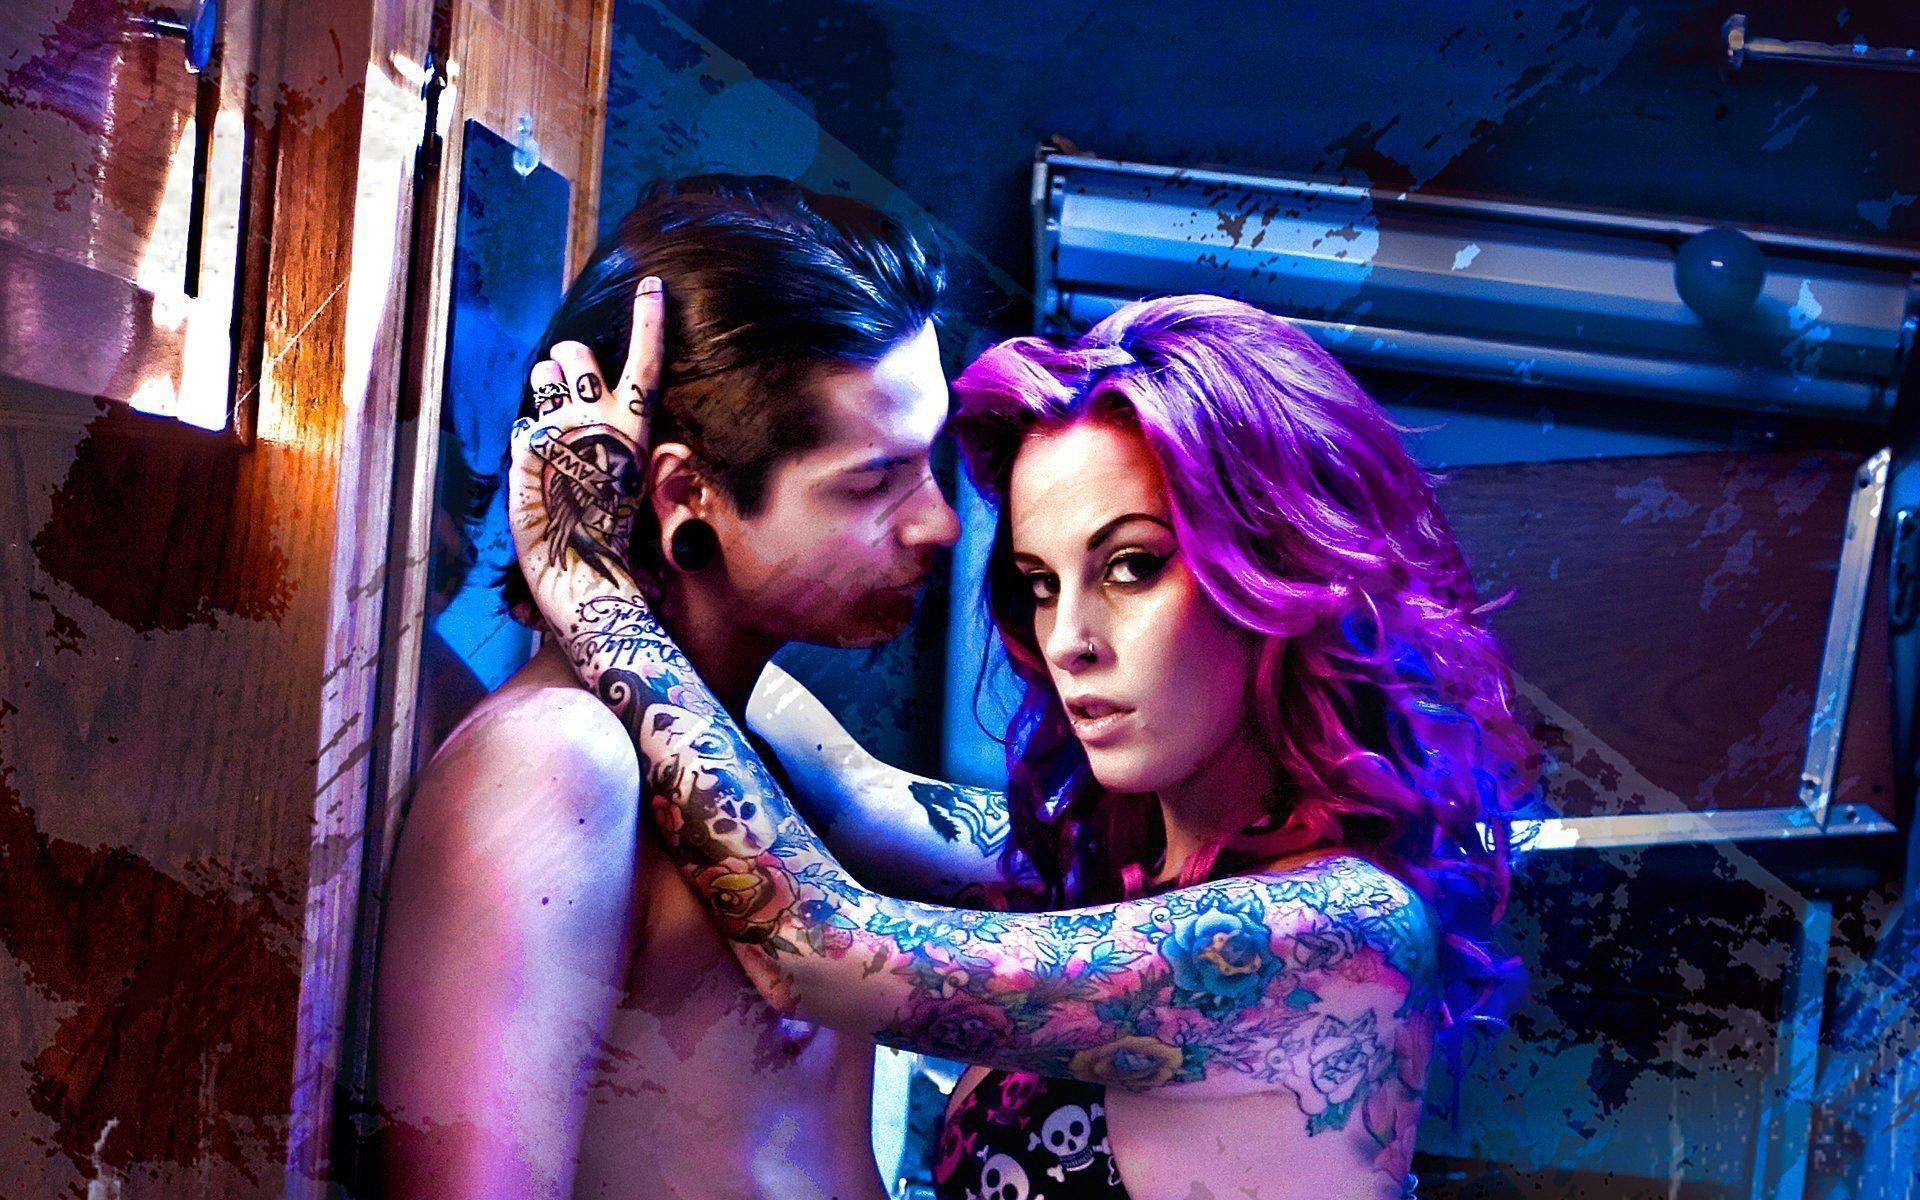 Tattoo Women wallpapers HD quality